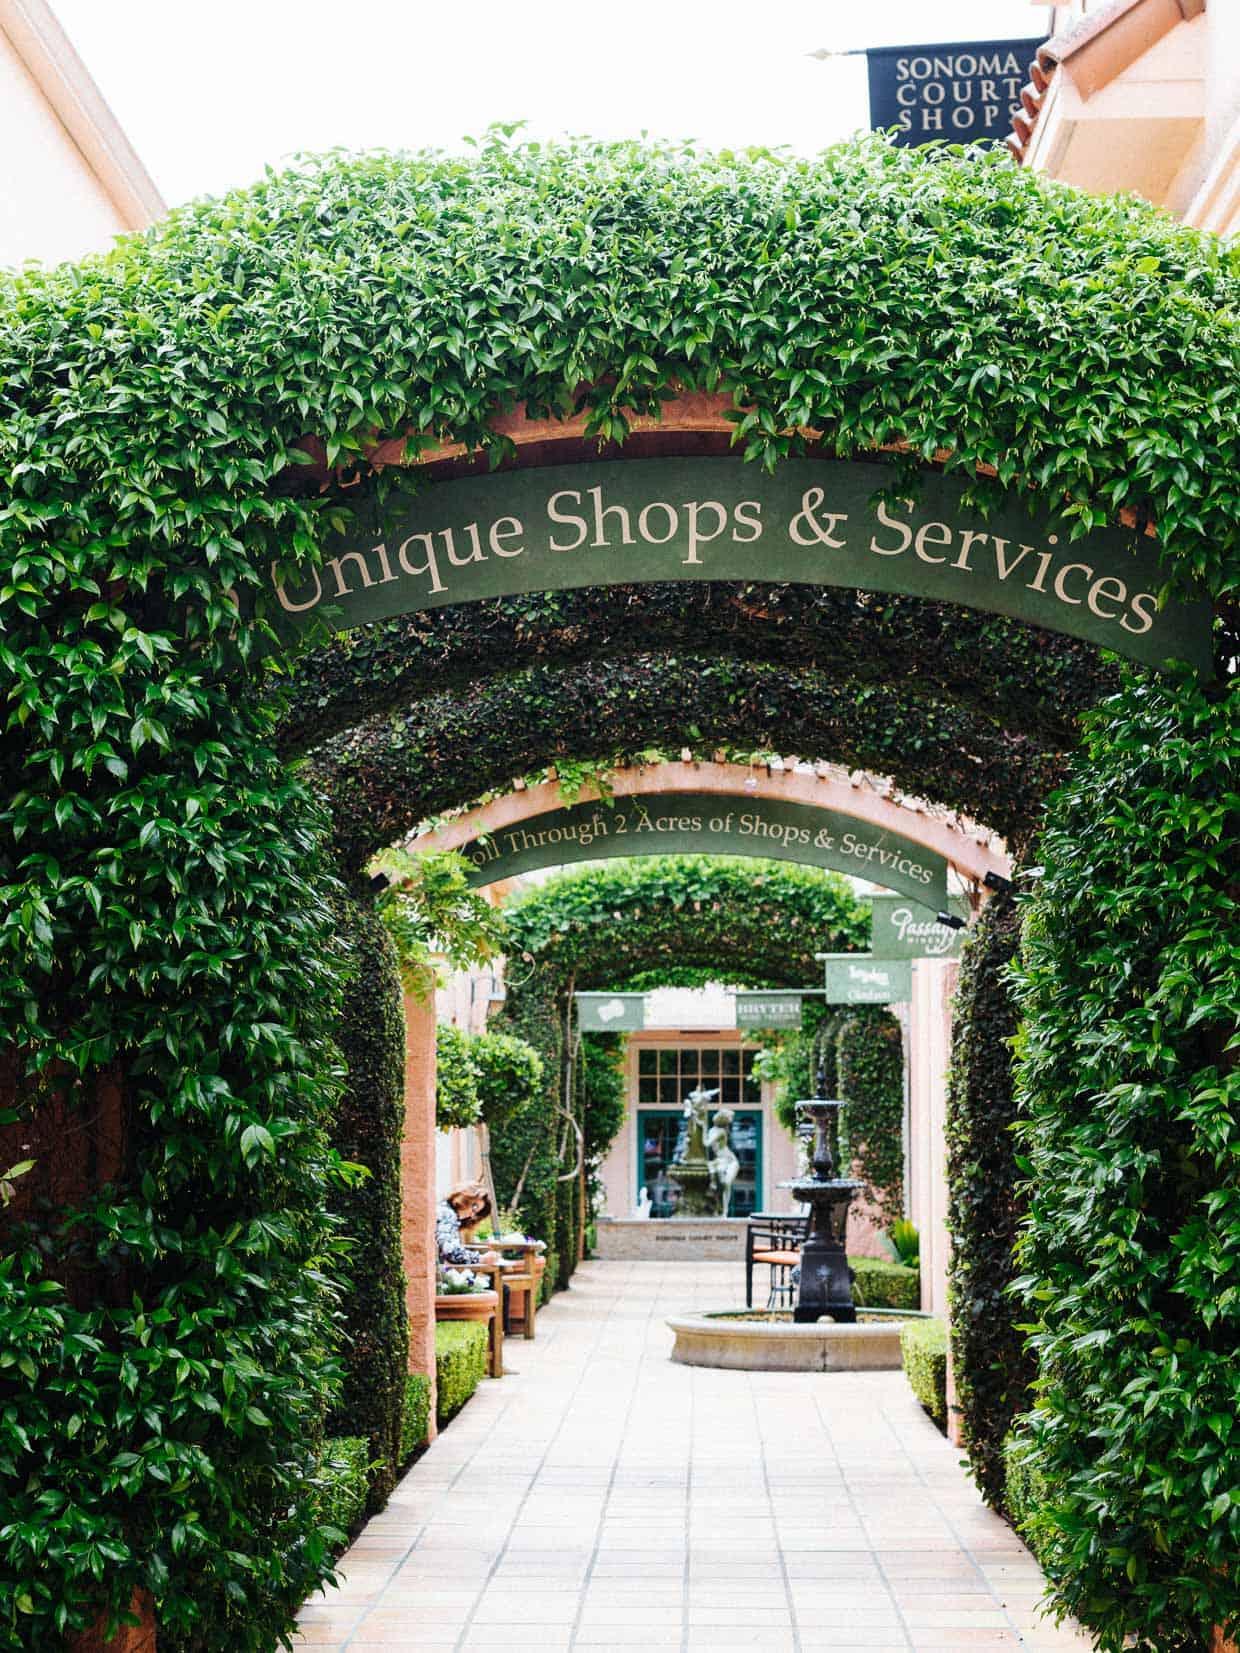 Sonoma Court Shops.